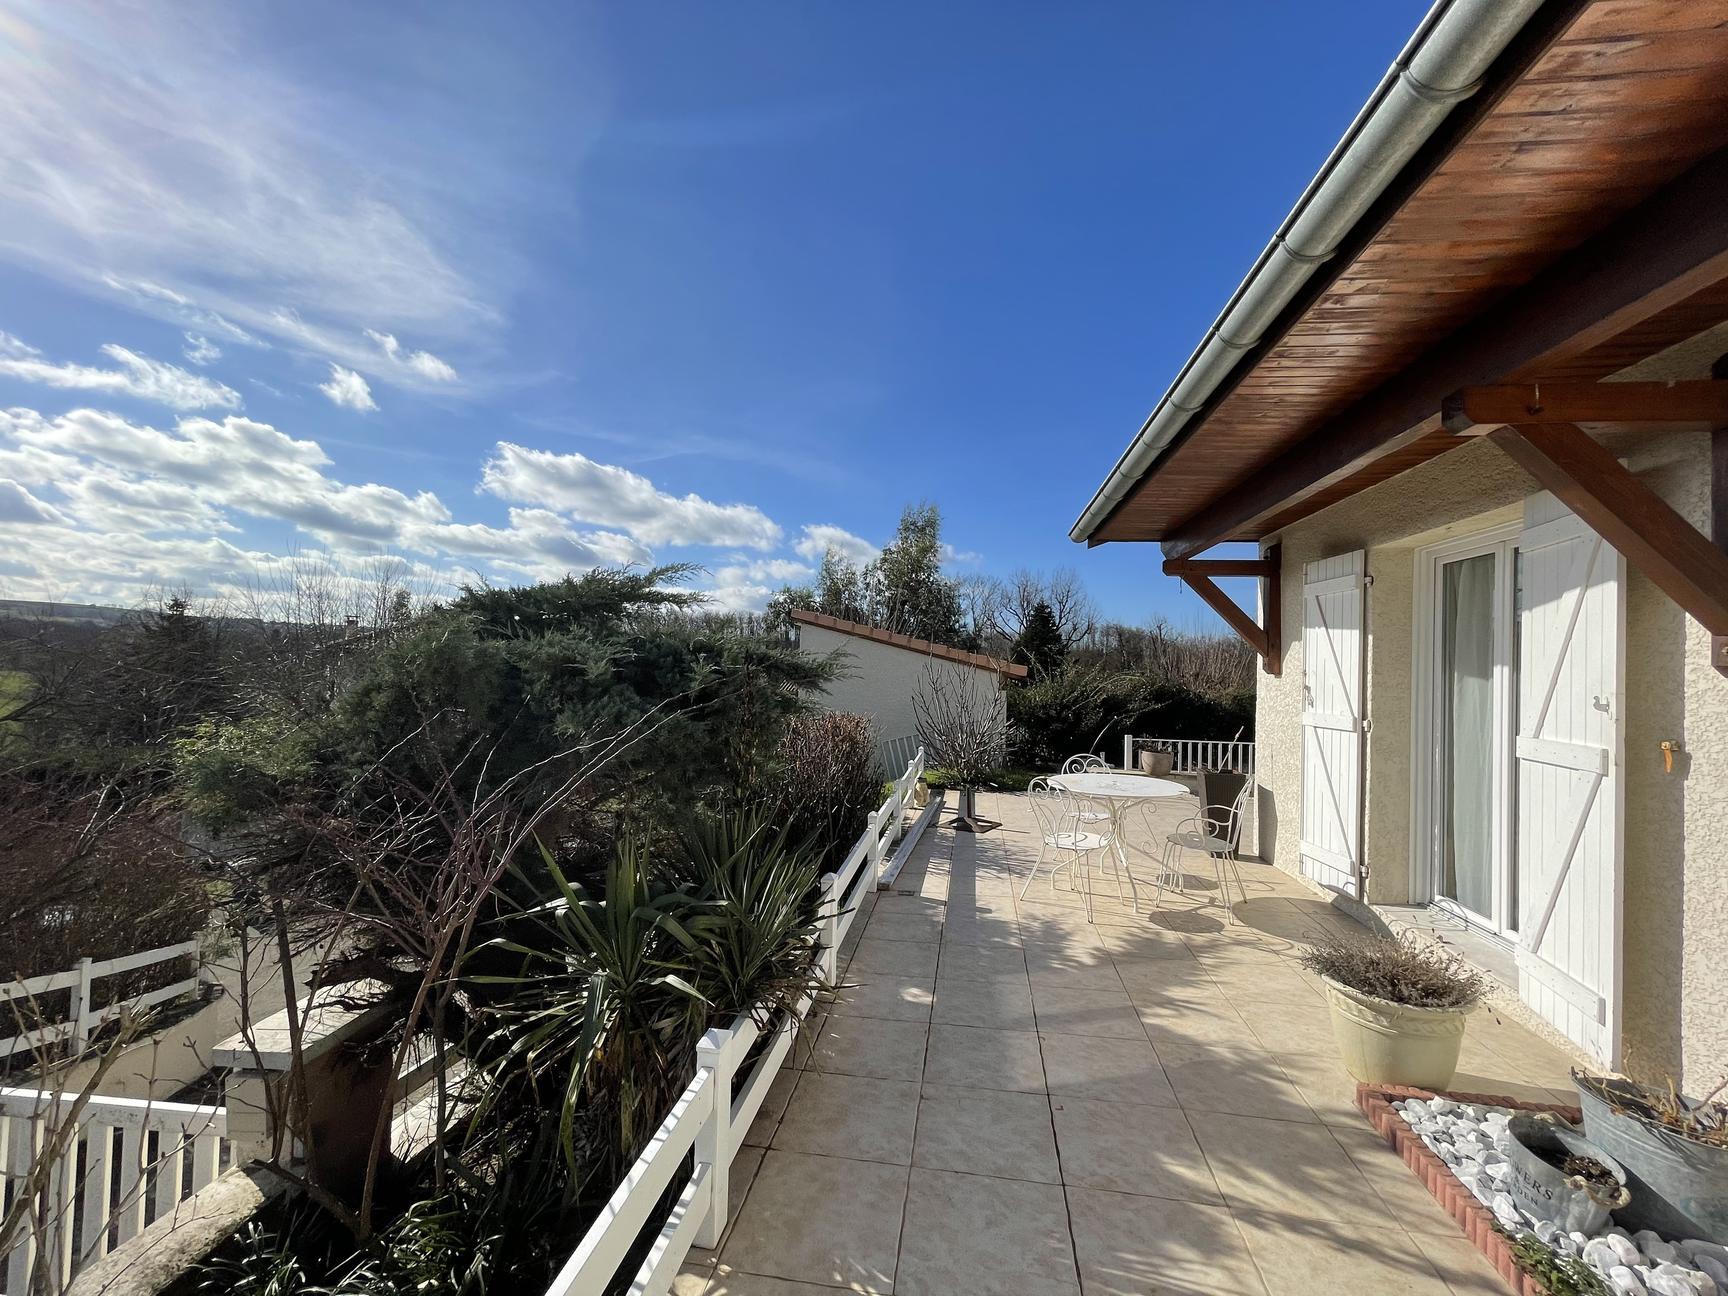 DOMMARTIN villa 150m2 4 chambres piscine - Dommartin